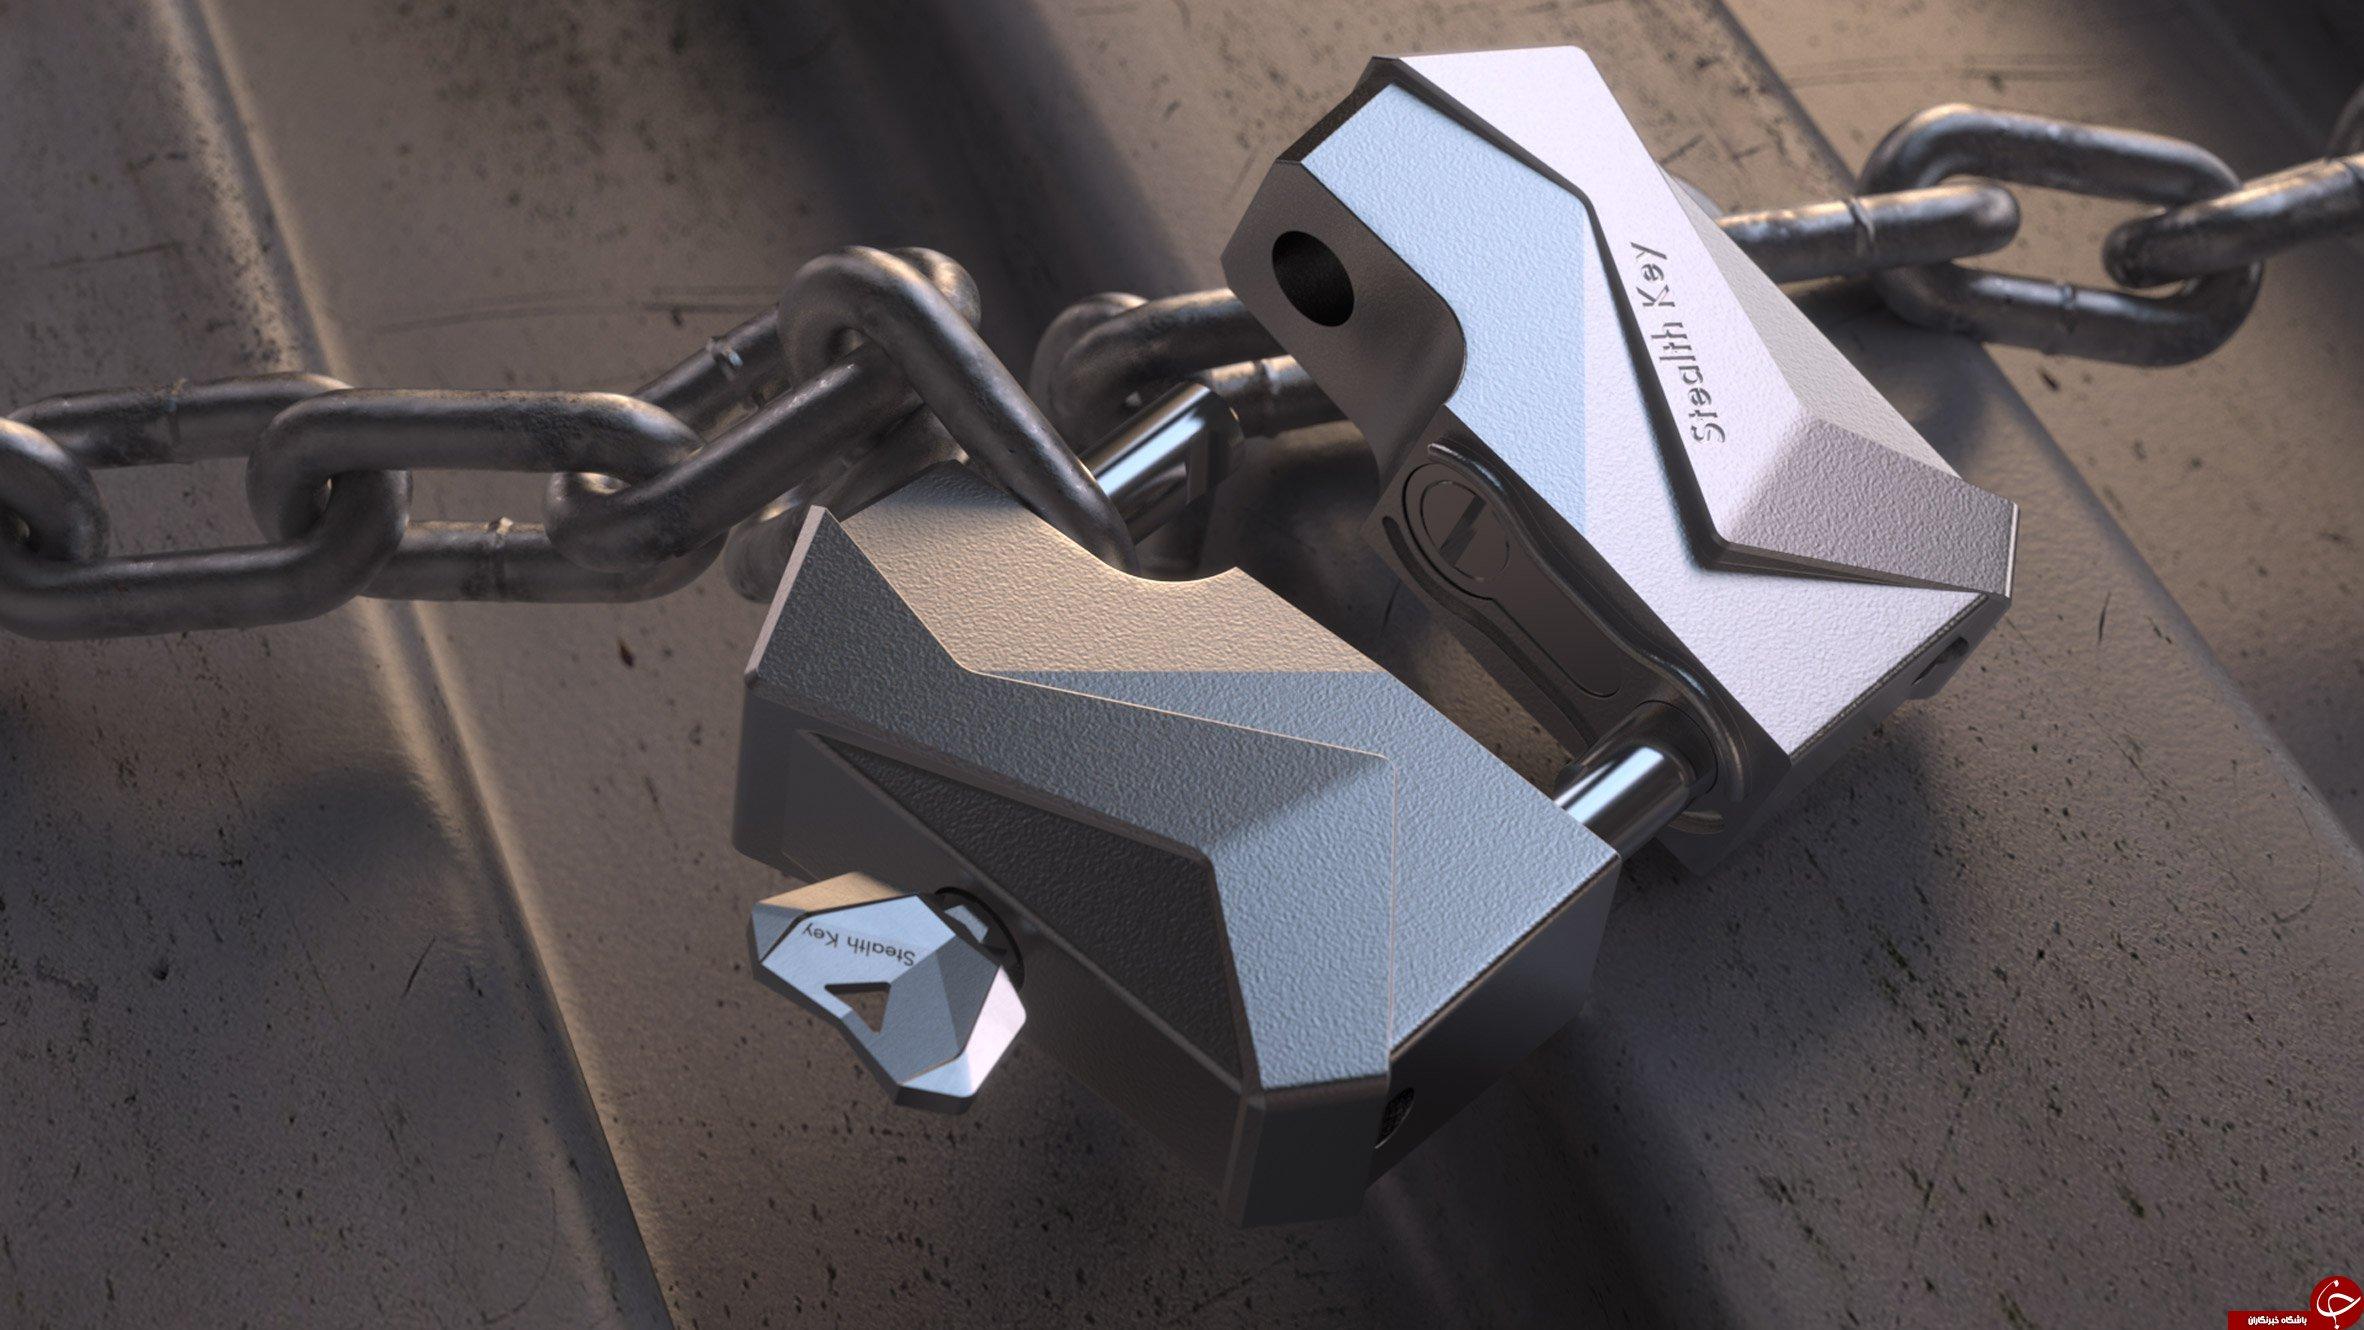 ساخت کلیدی جالب با فناوری چاپ سه بعدی+ عکس